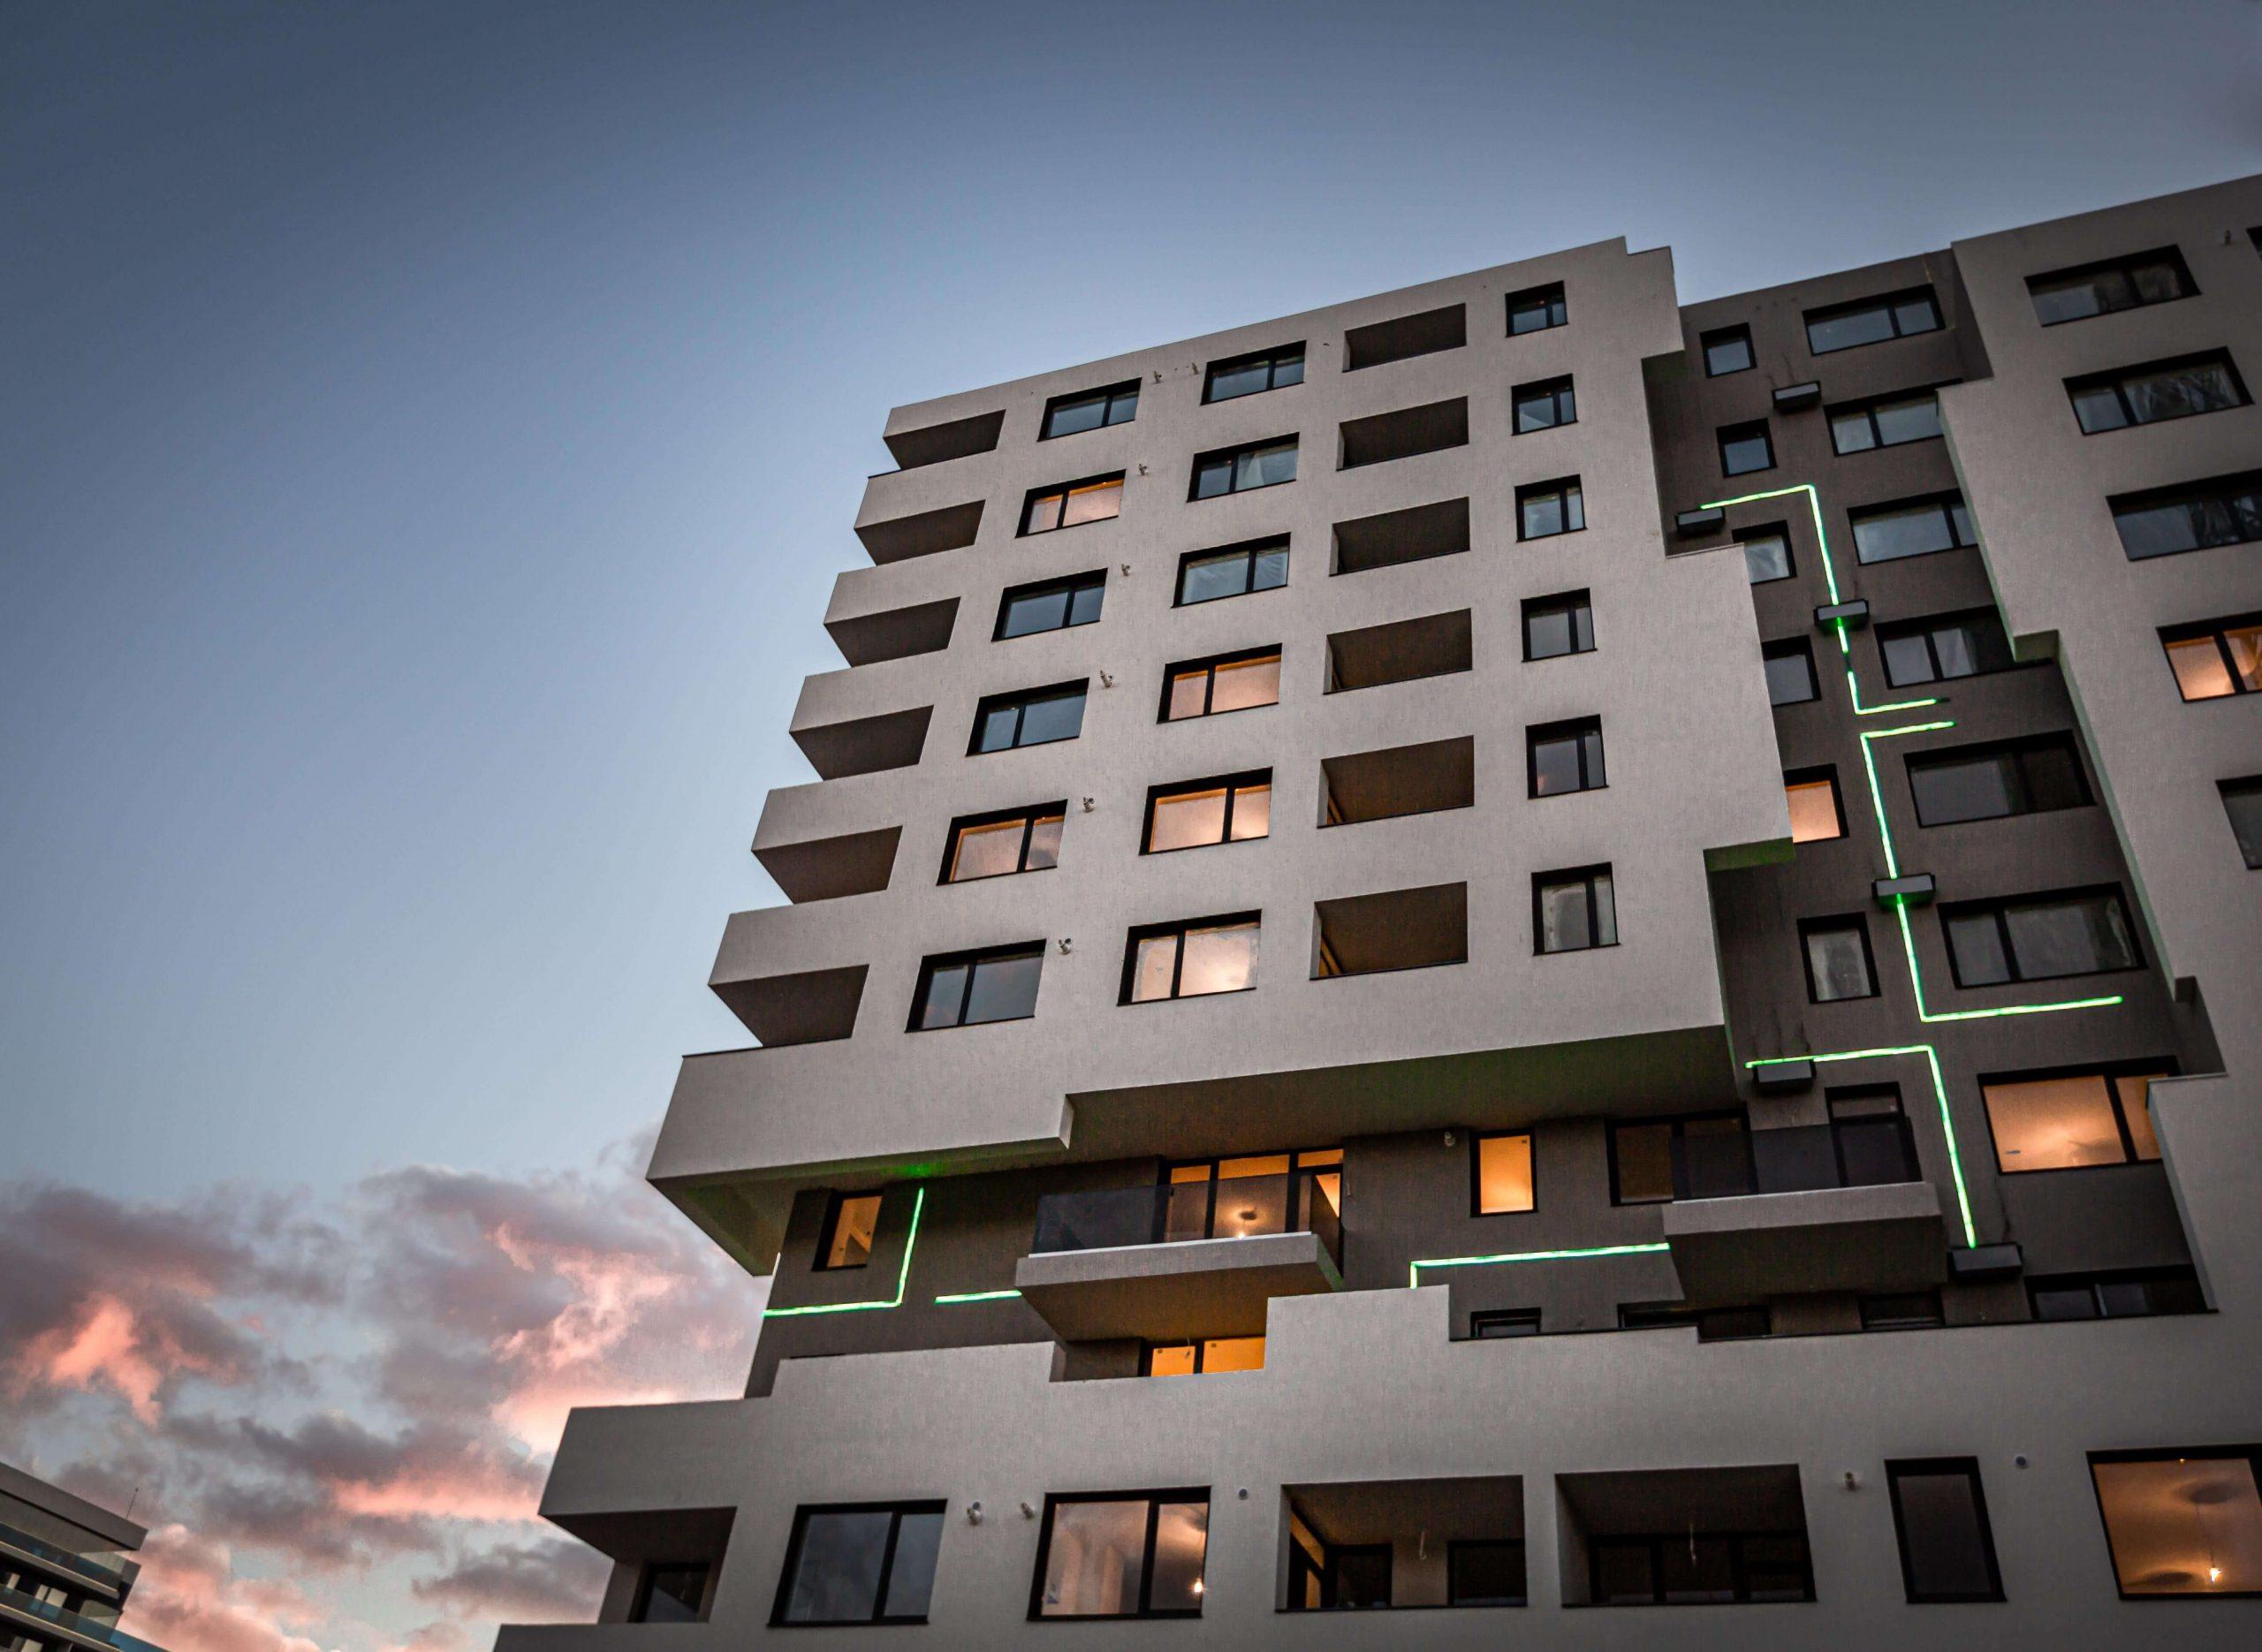 poza exterior sunnyville bloc apartament